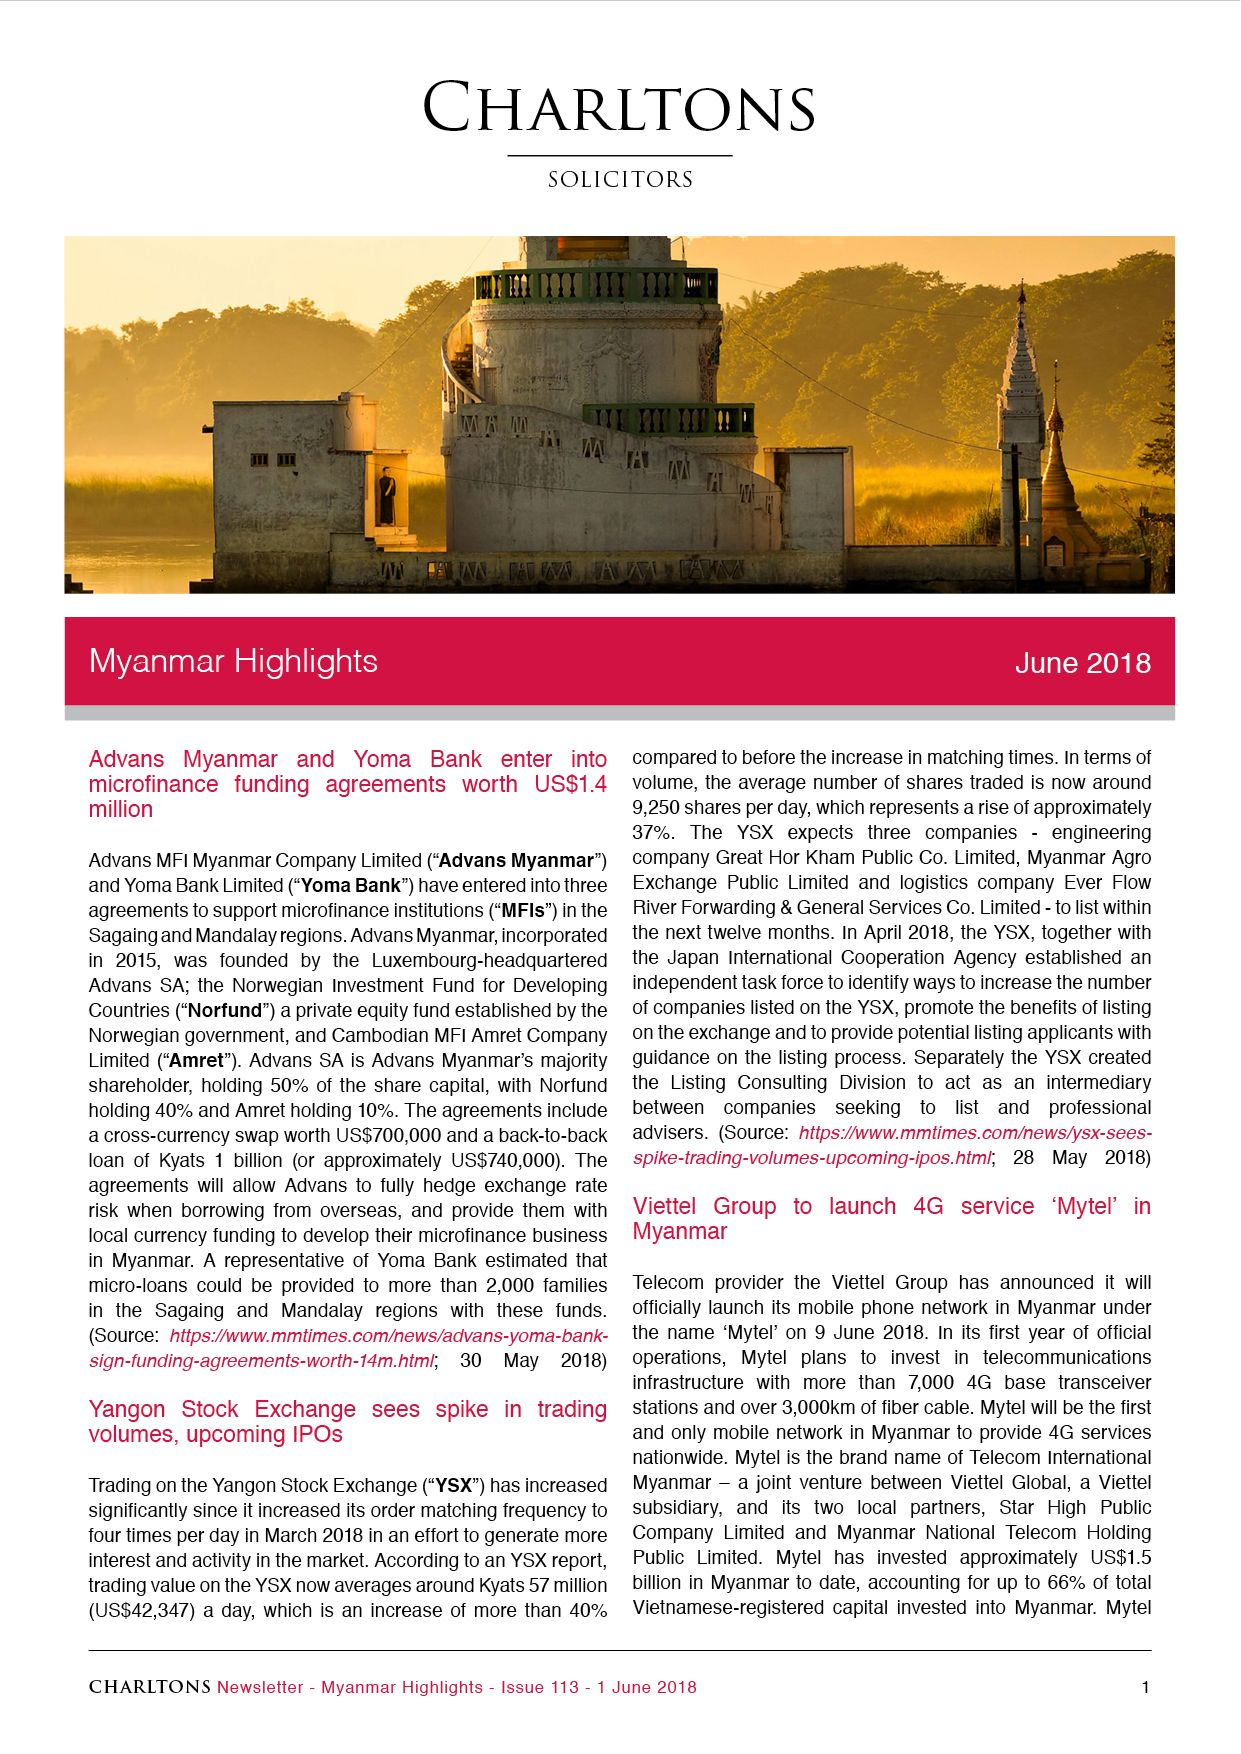 Advans Myanmar And Yoma Bank Enter Into Microfinance Funding